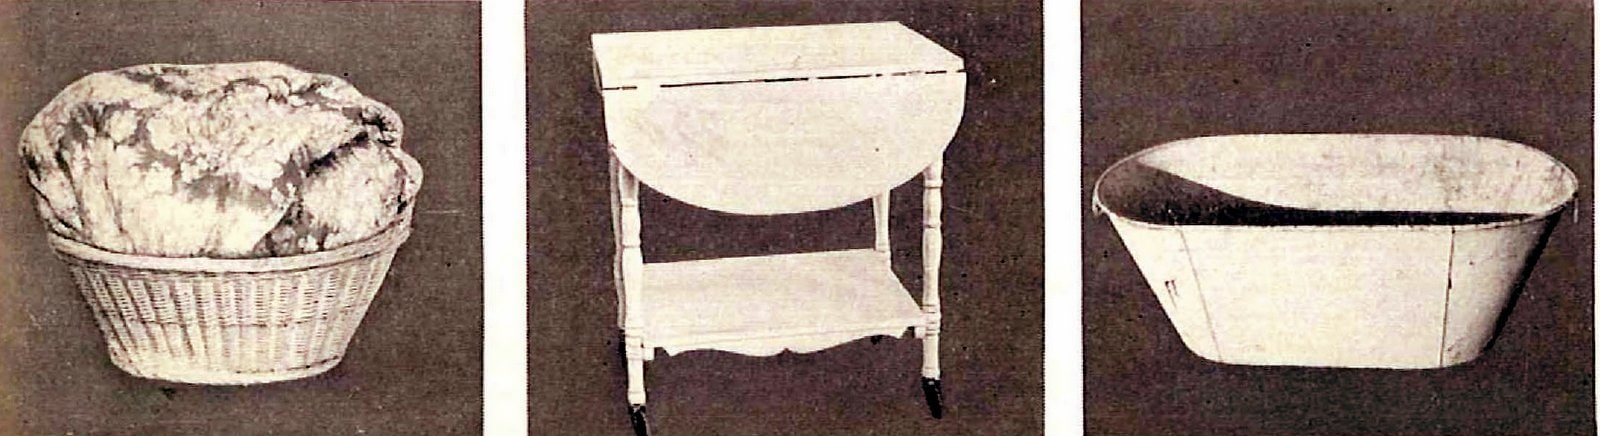 Before - antique baby nursery items before repainting